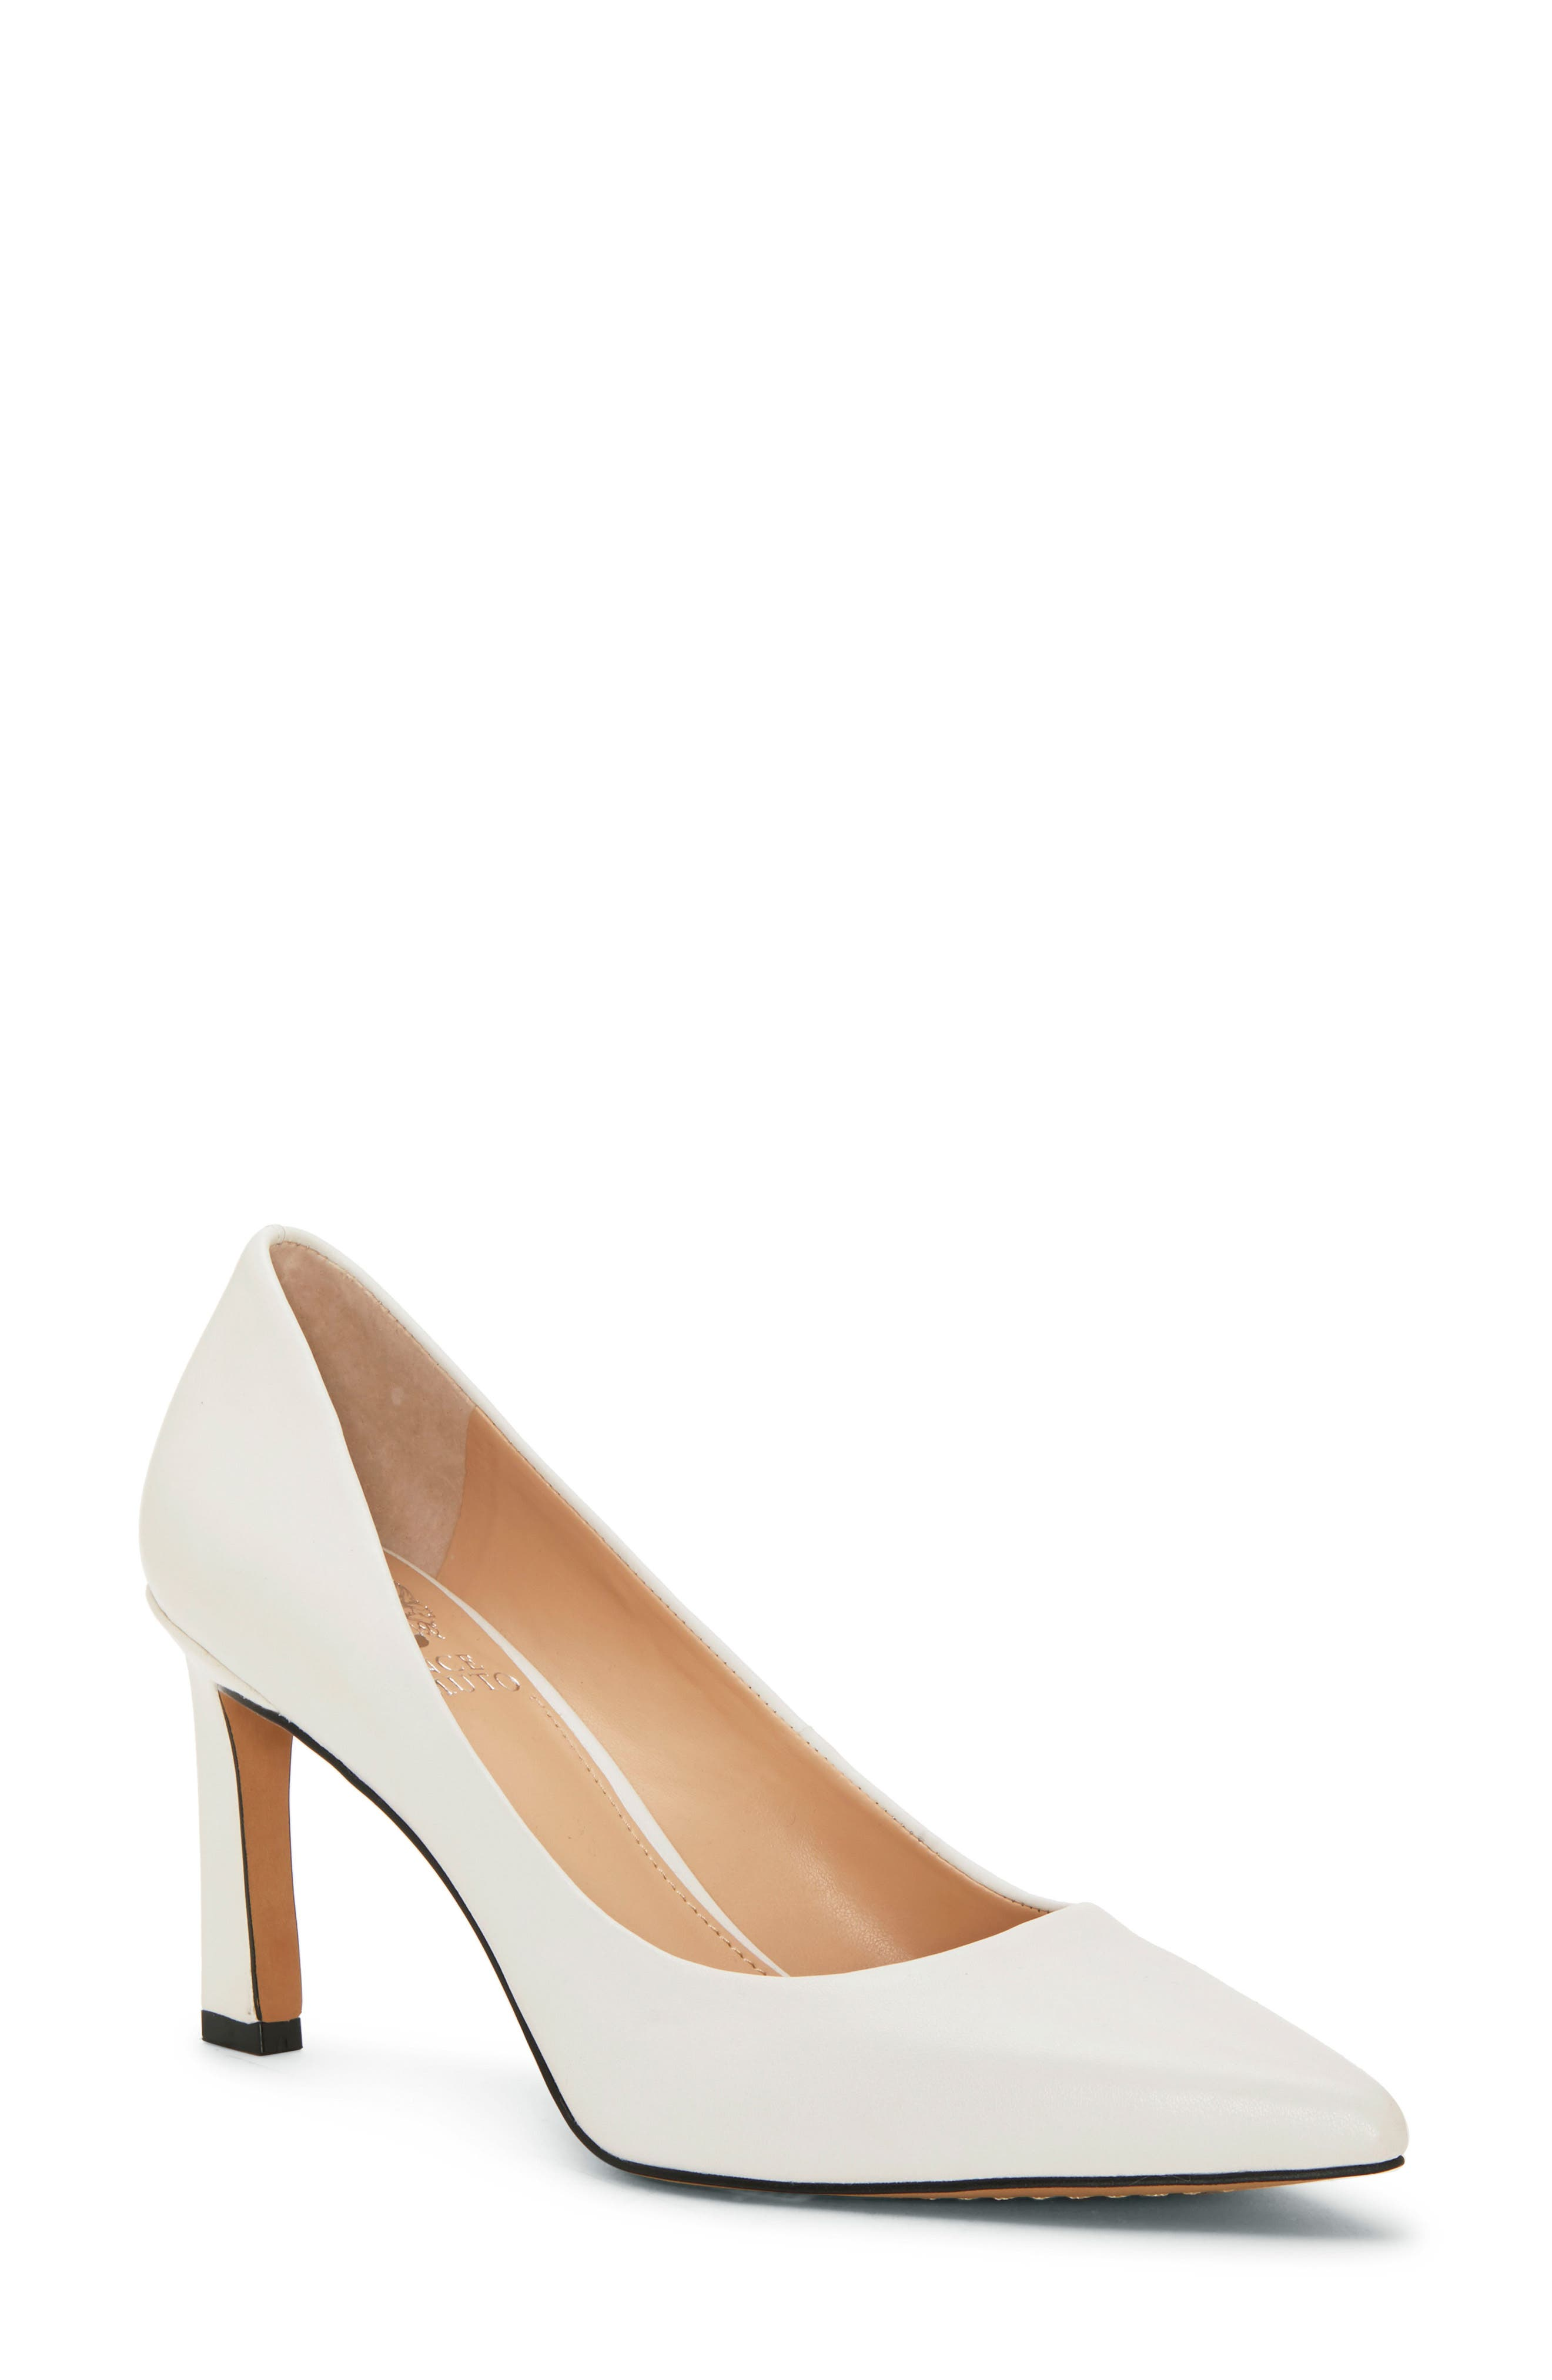 Women/'s Shoes Vince Camuto NIOMI Platforms Pumps Stiletto Heels POWDER BLUSH